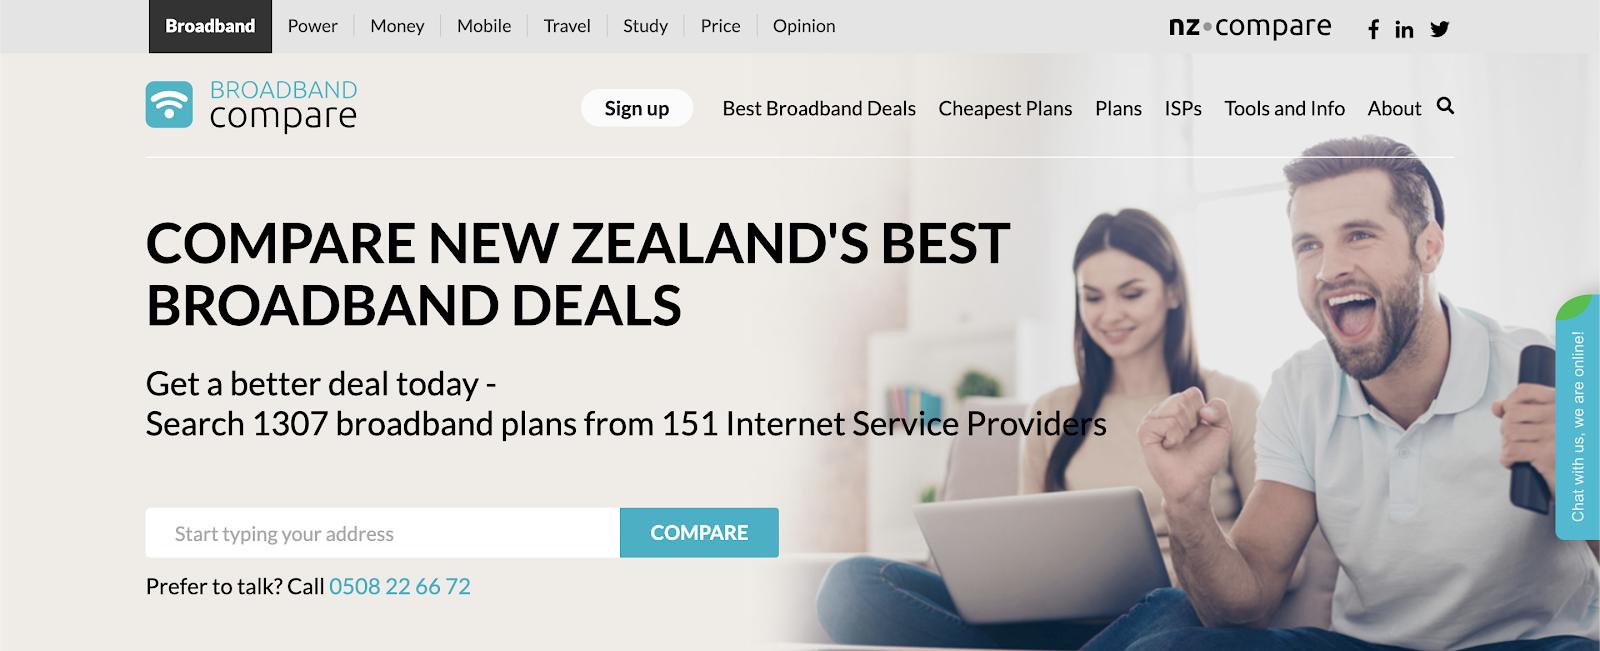 BroadbandCompare